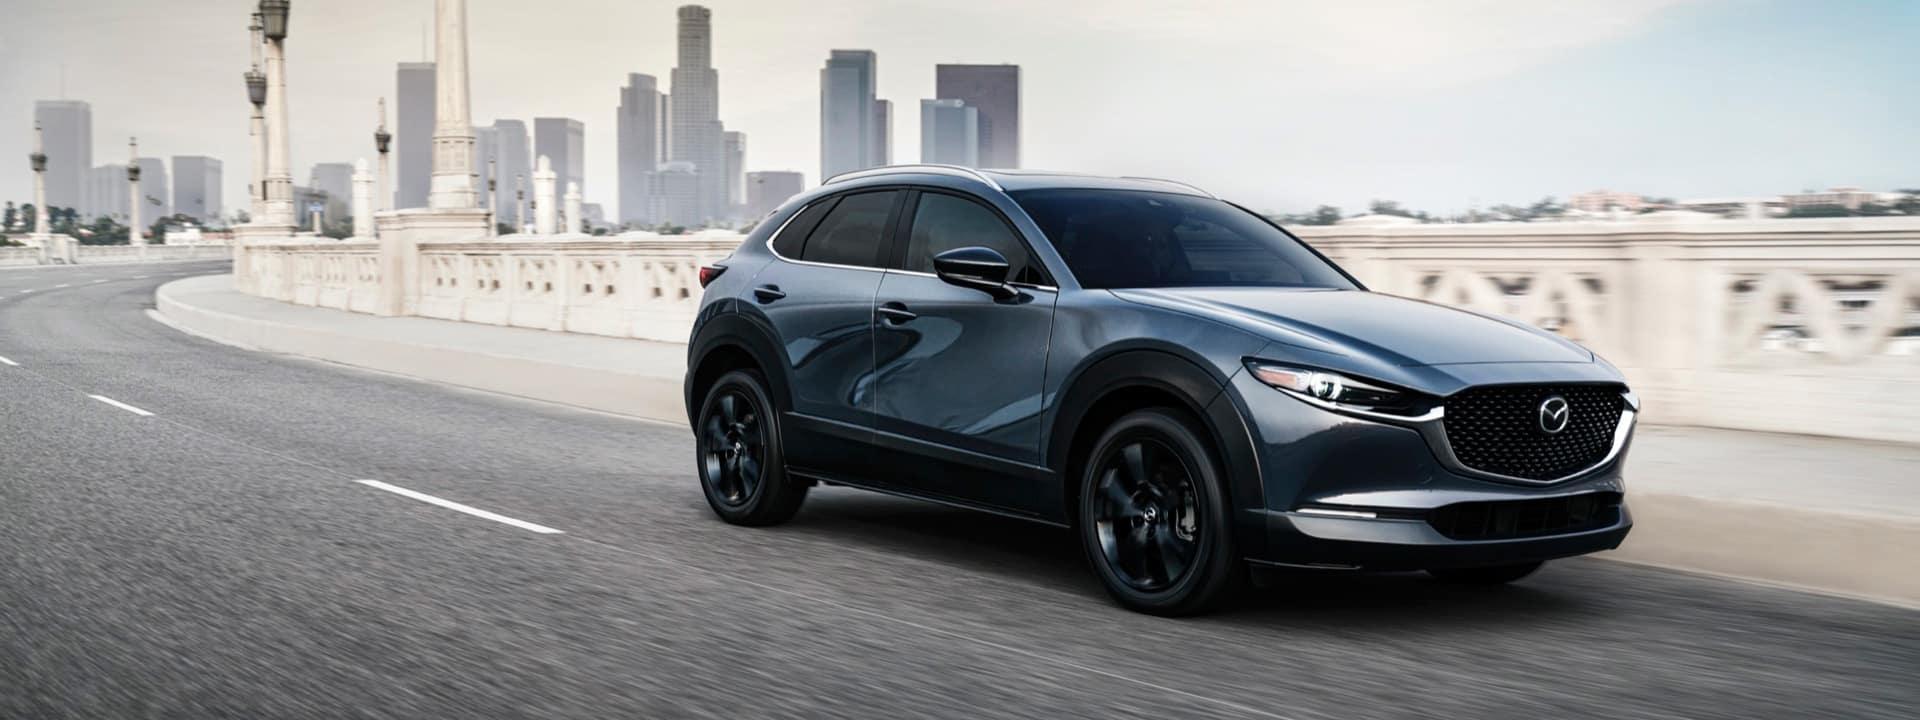 2021 Mazda CX-5 OKC